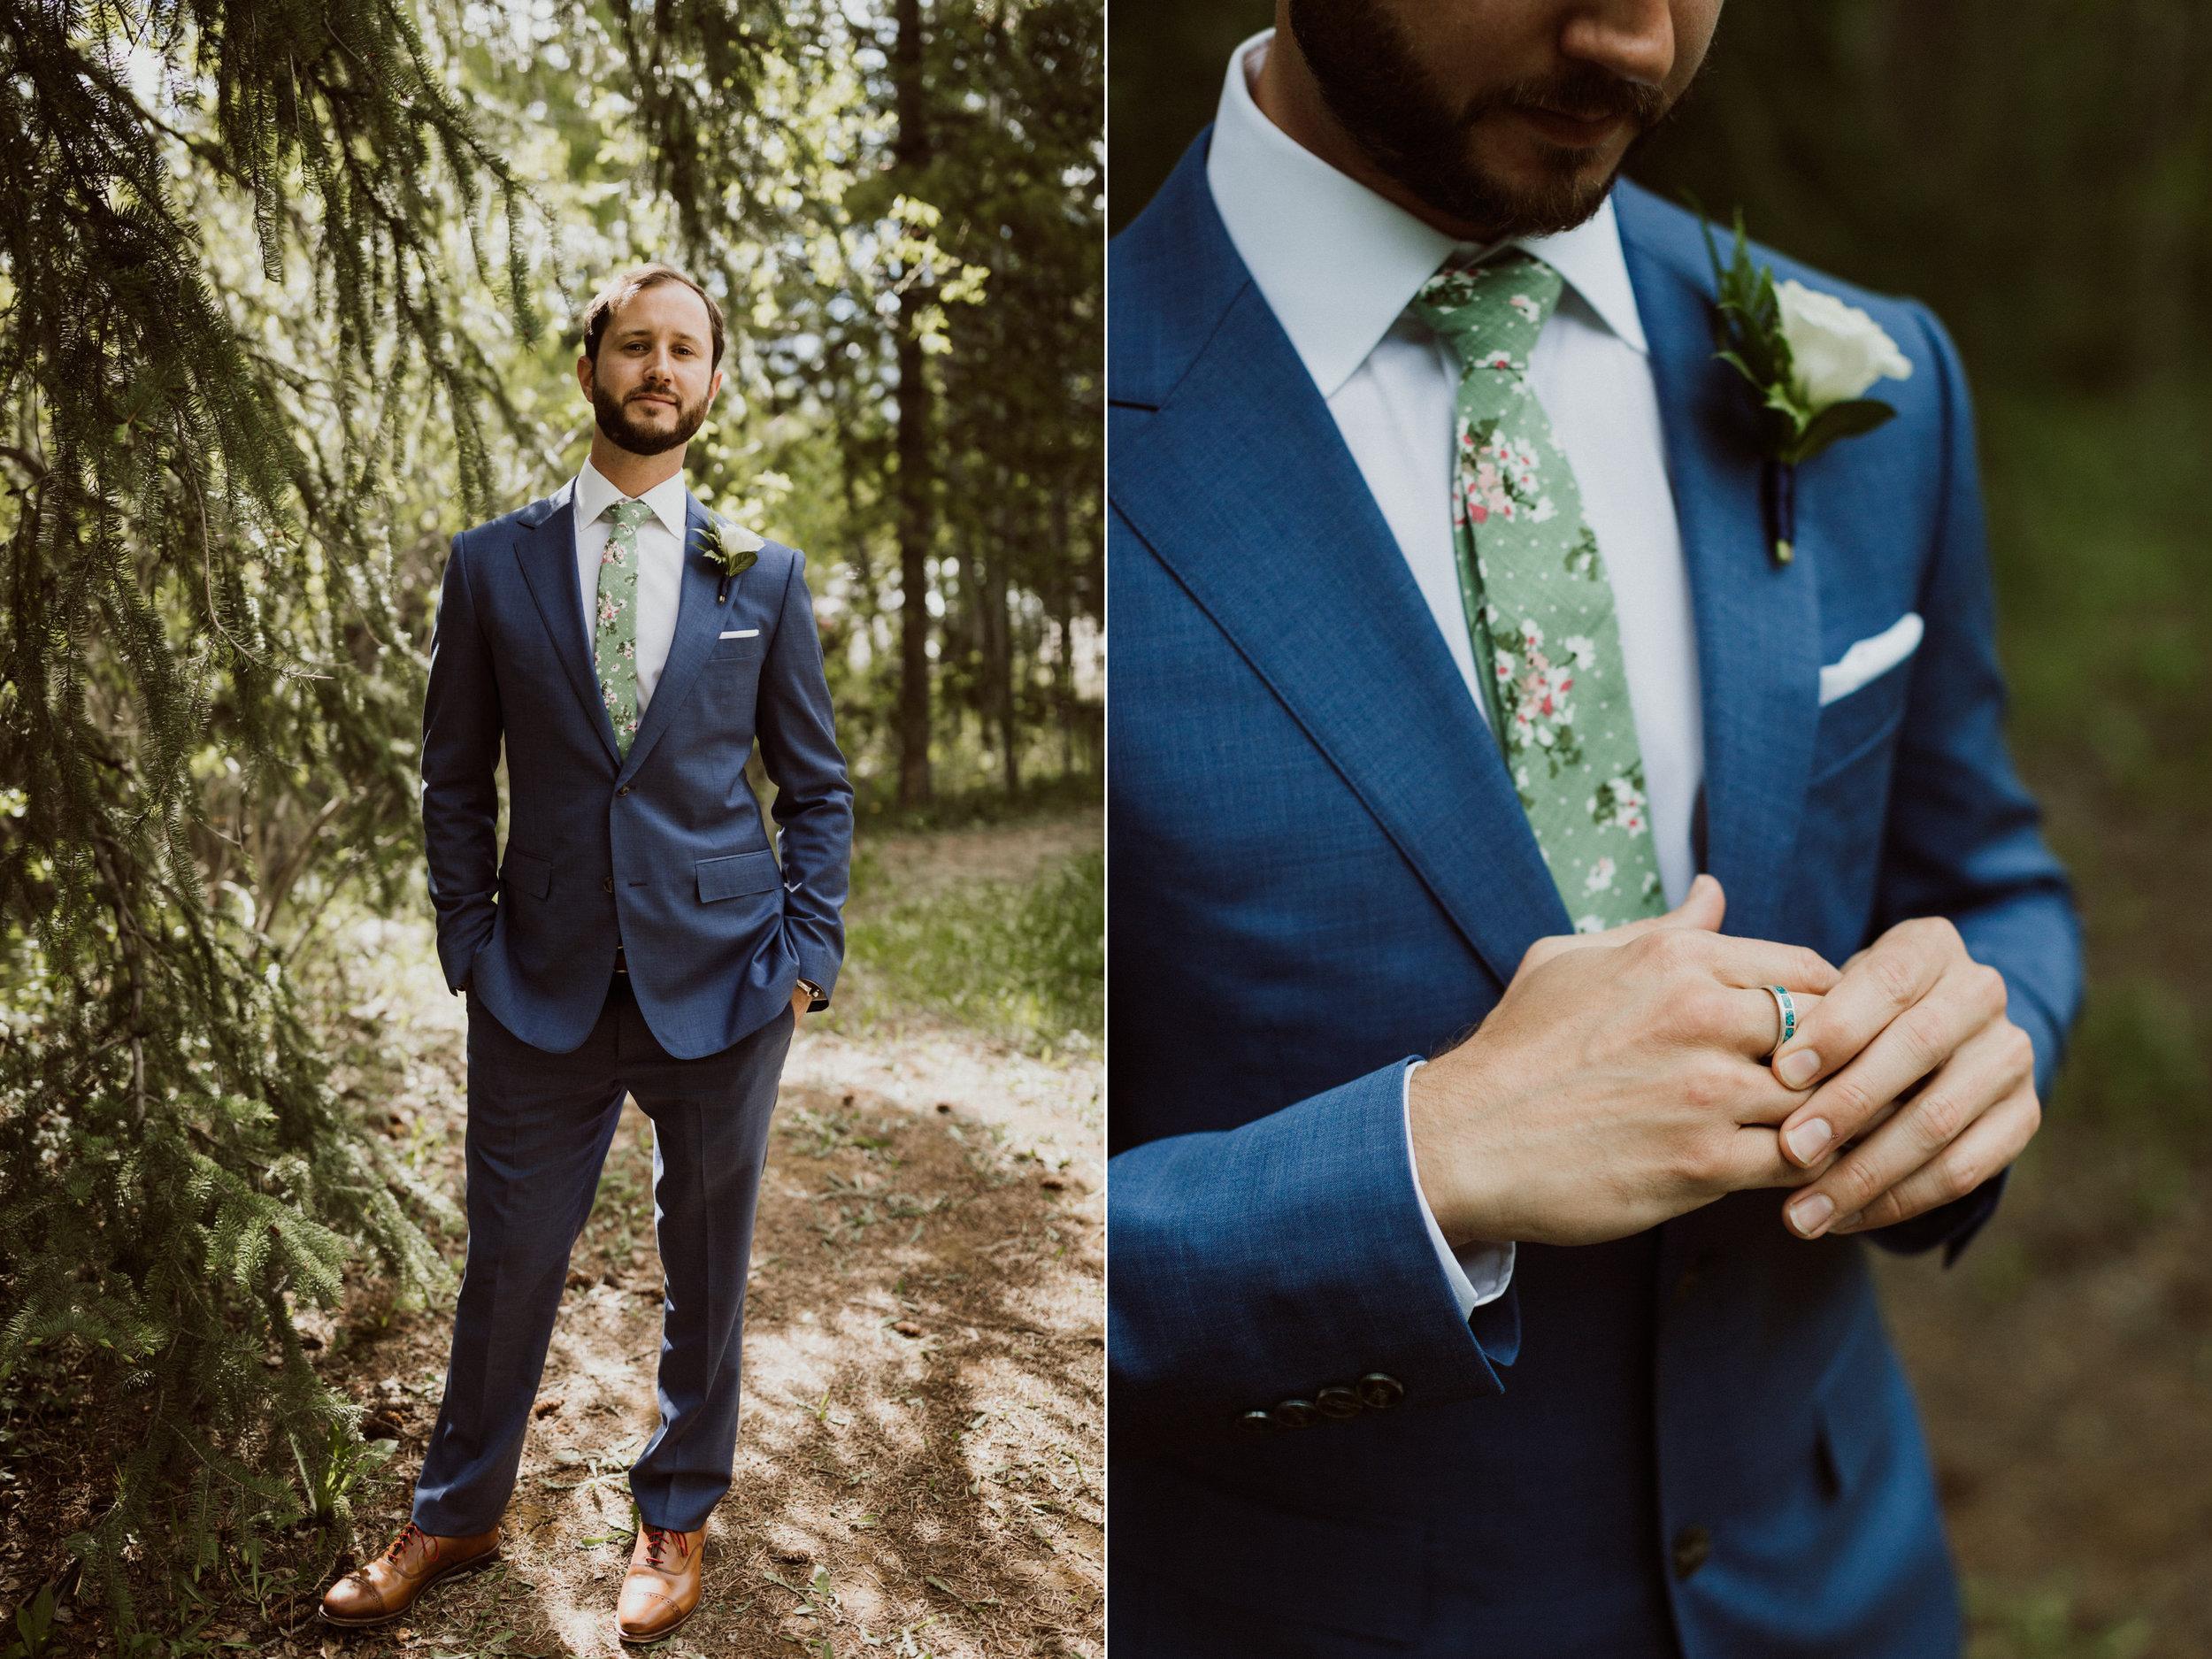 bohemian-backyard-wedding-breckenridge-colorado-159.jpg